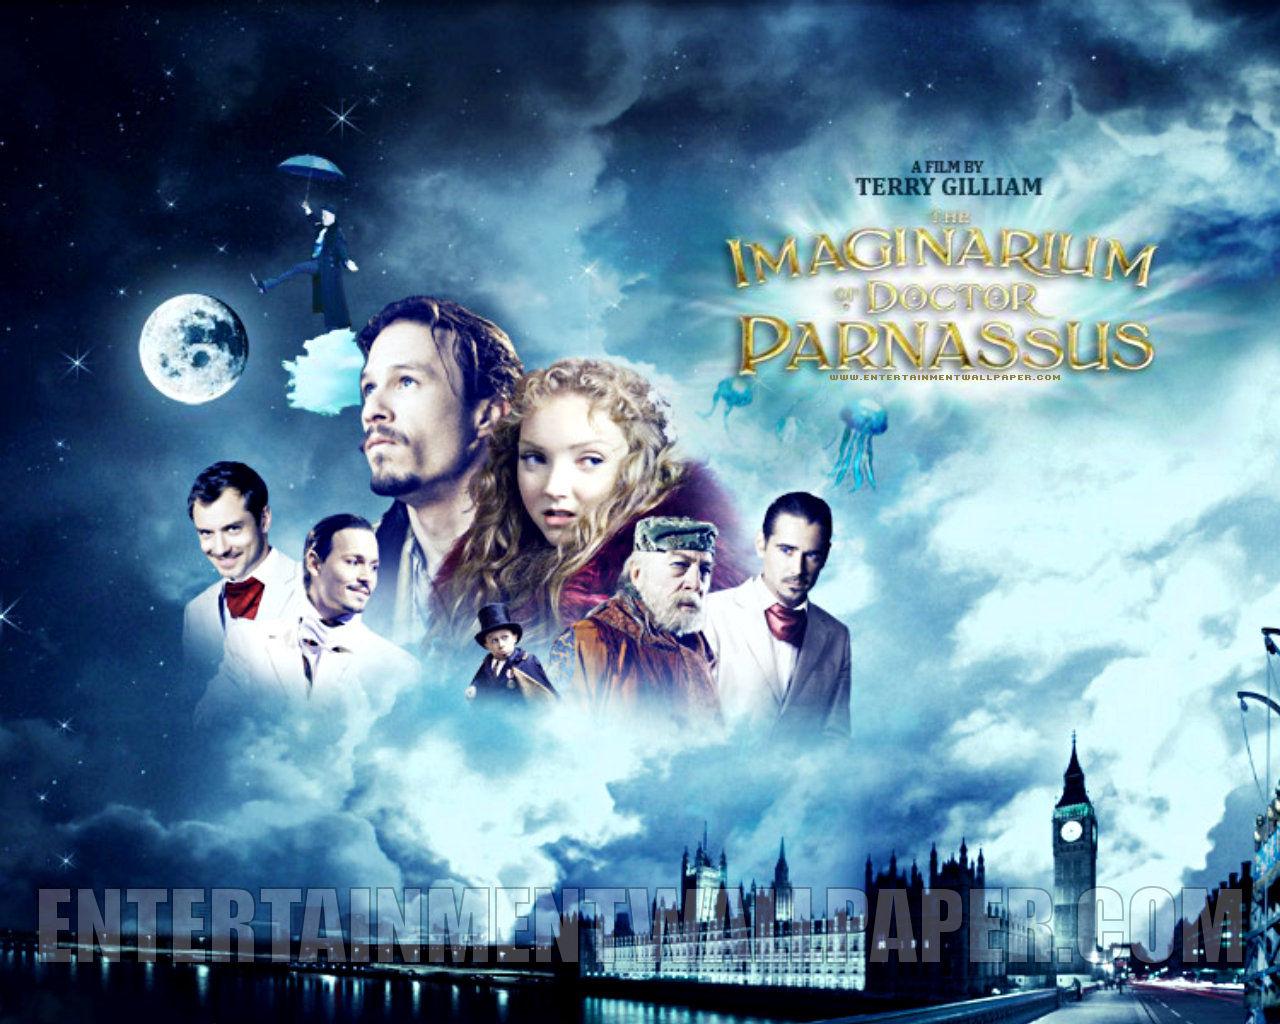 mundo imaginario do dr parnassus